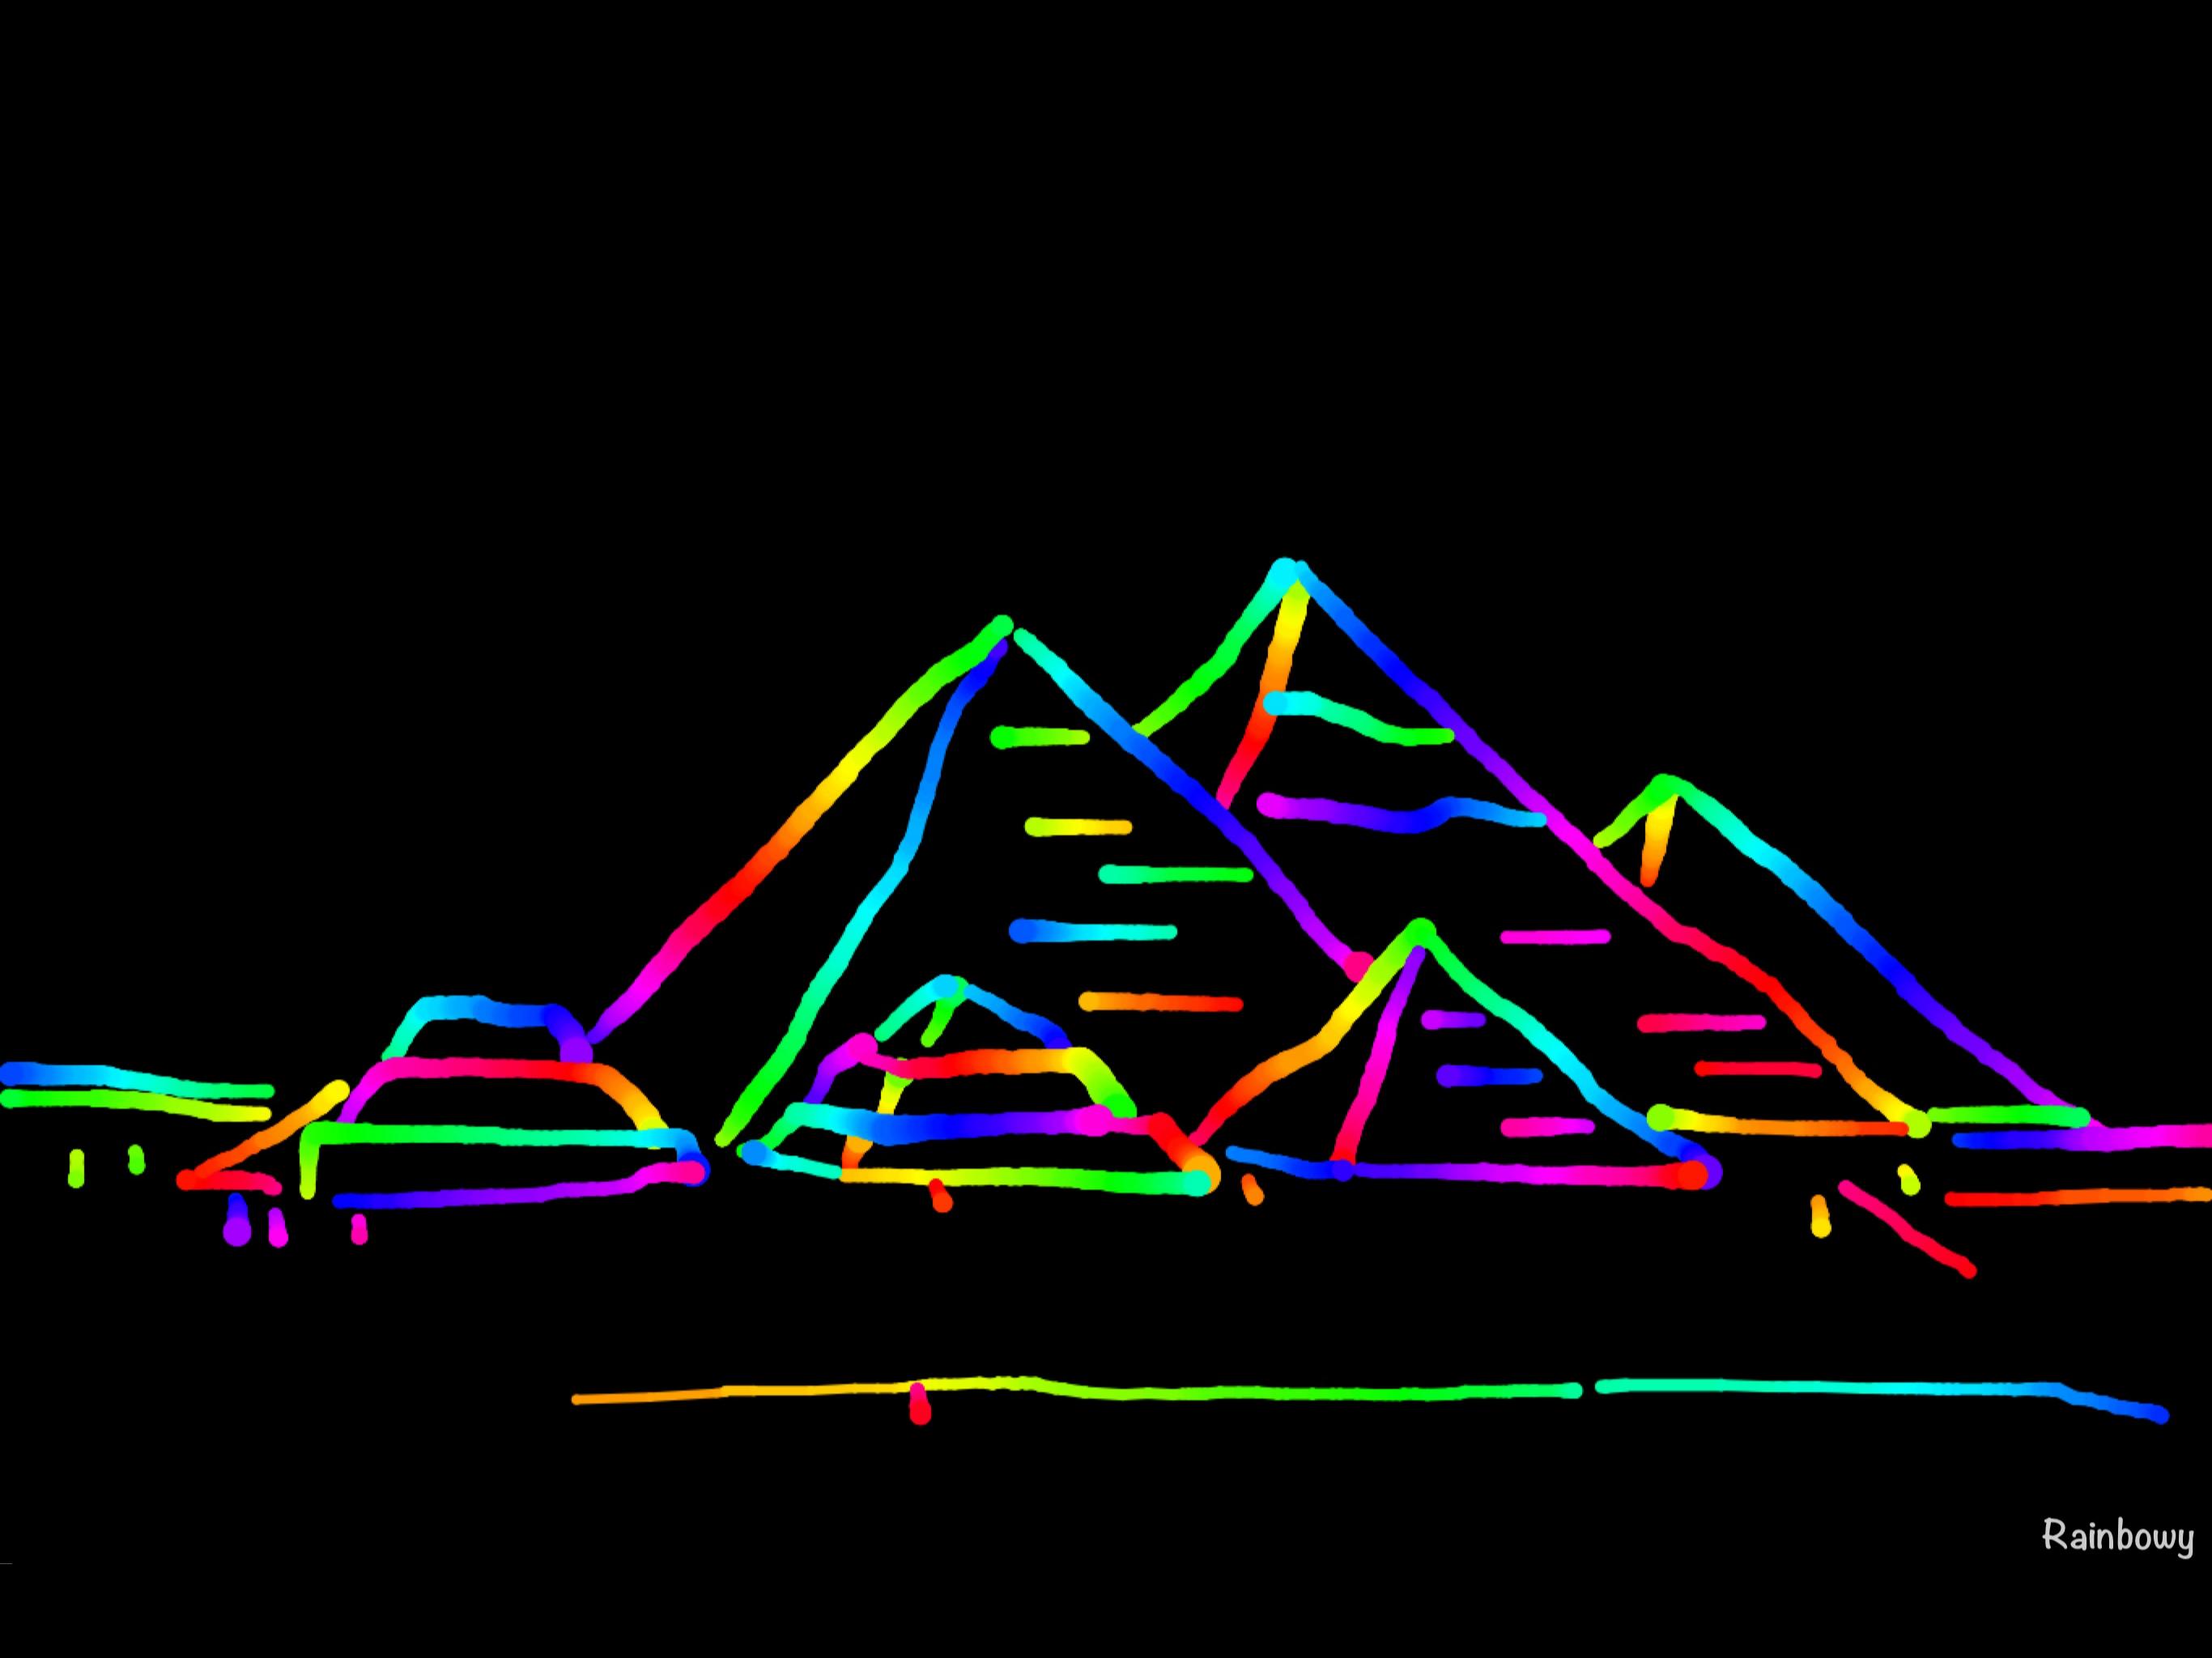 iPad pro Rainbowy piramids